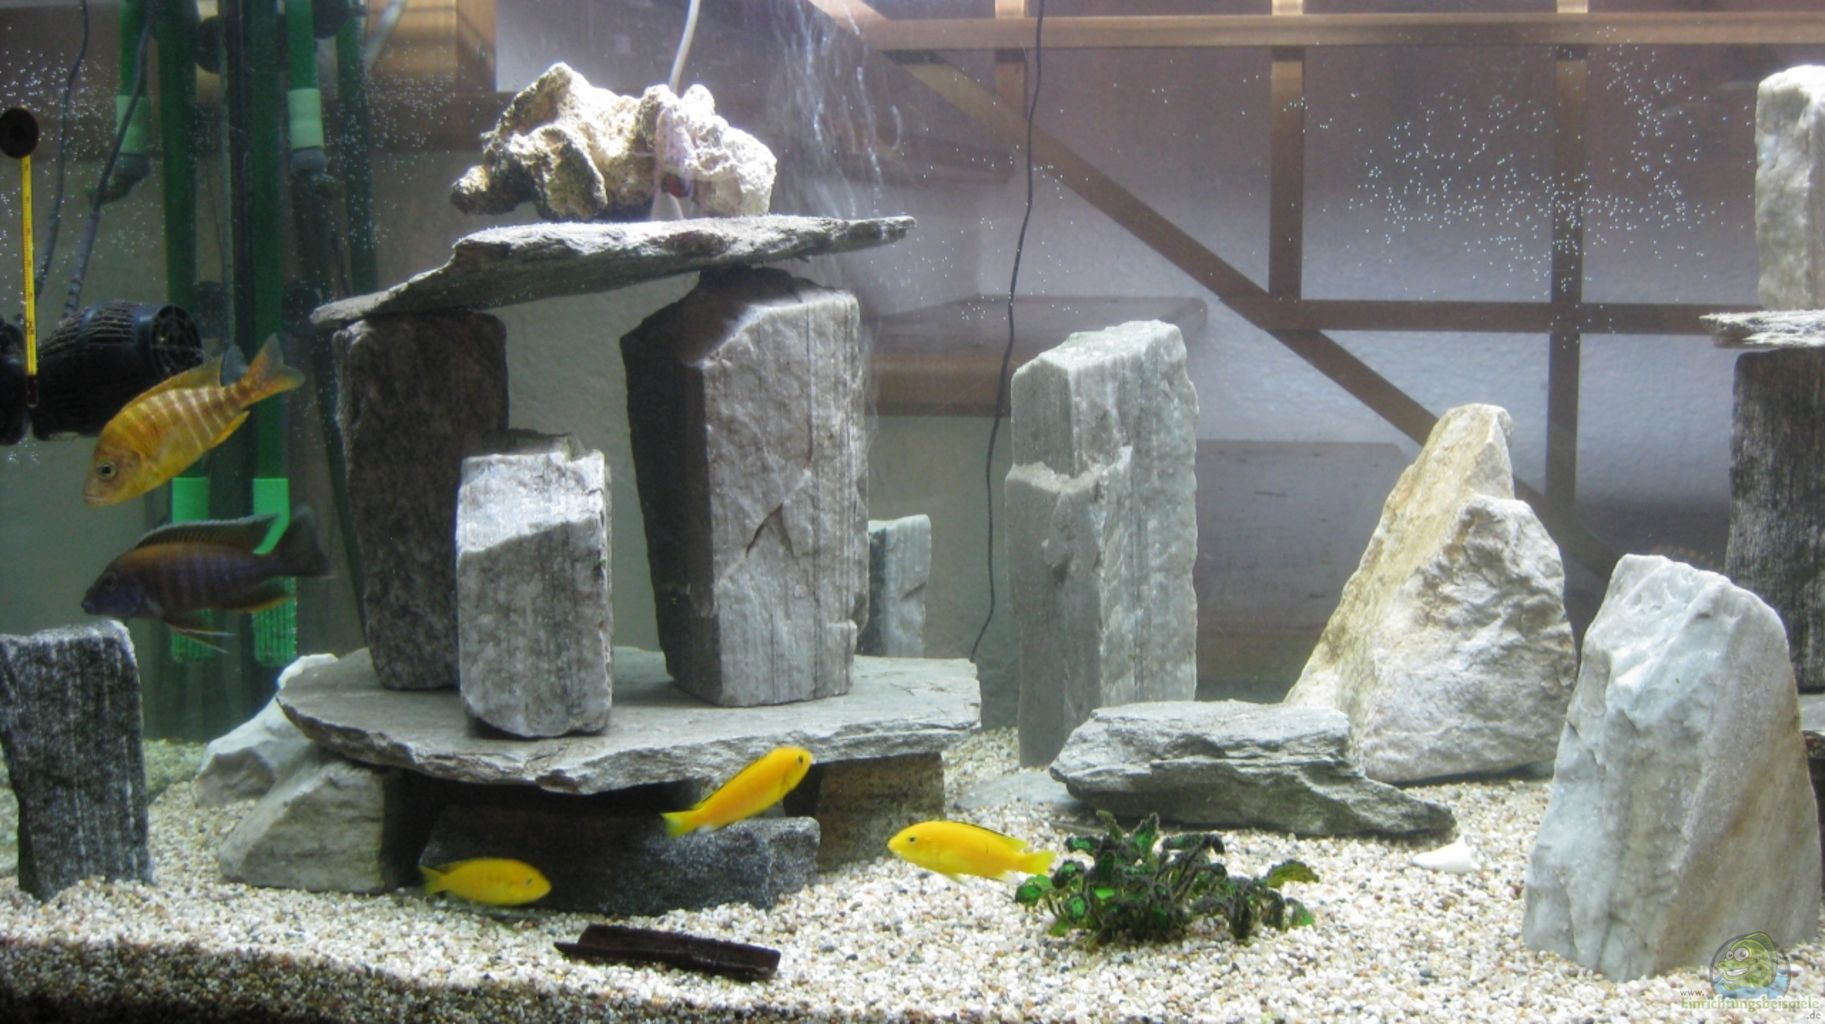 decor aquarium fait maison gallery of charneca de caparica with photos top holiday lettings. Black Bedroom Furniture Sets. Home Design Ideas